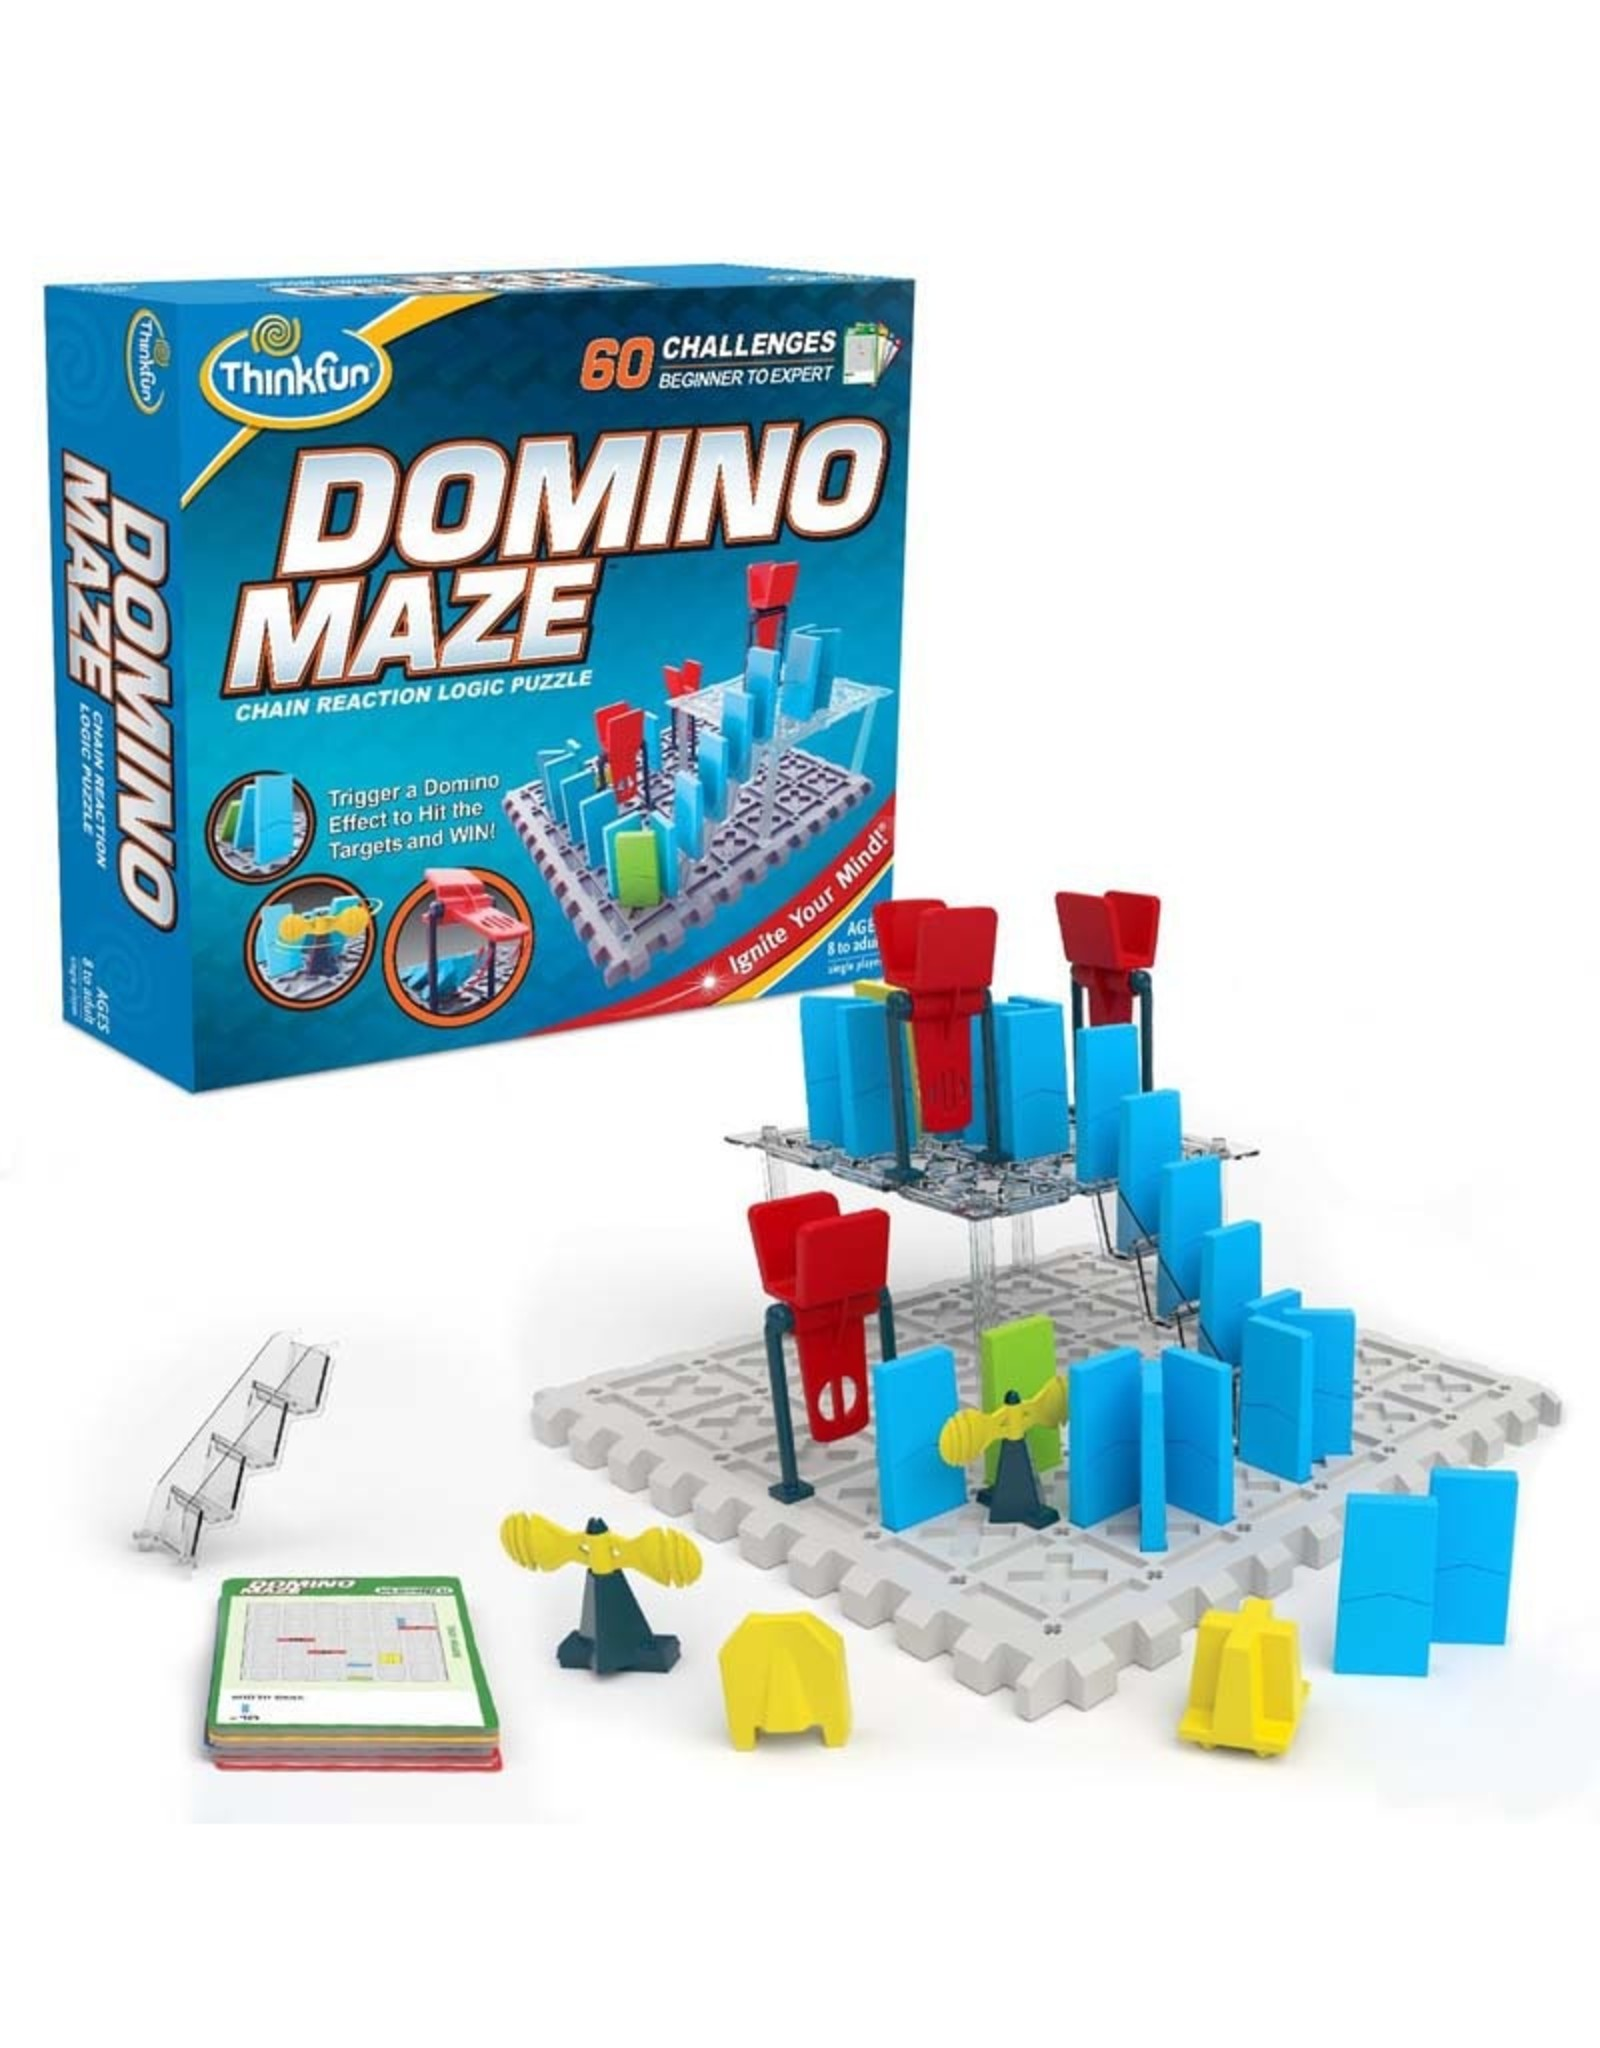 ##Domino Maze - NEW!